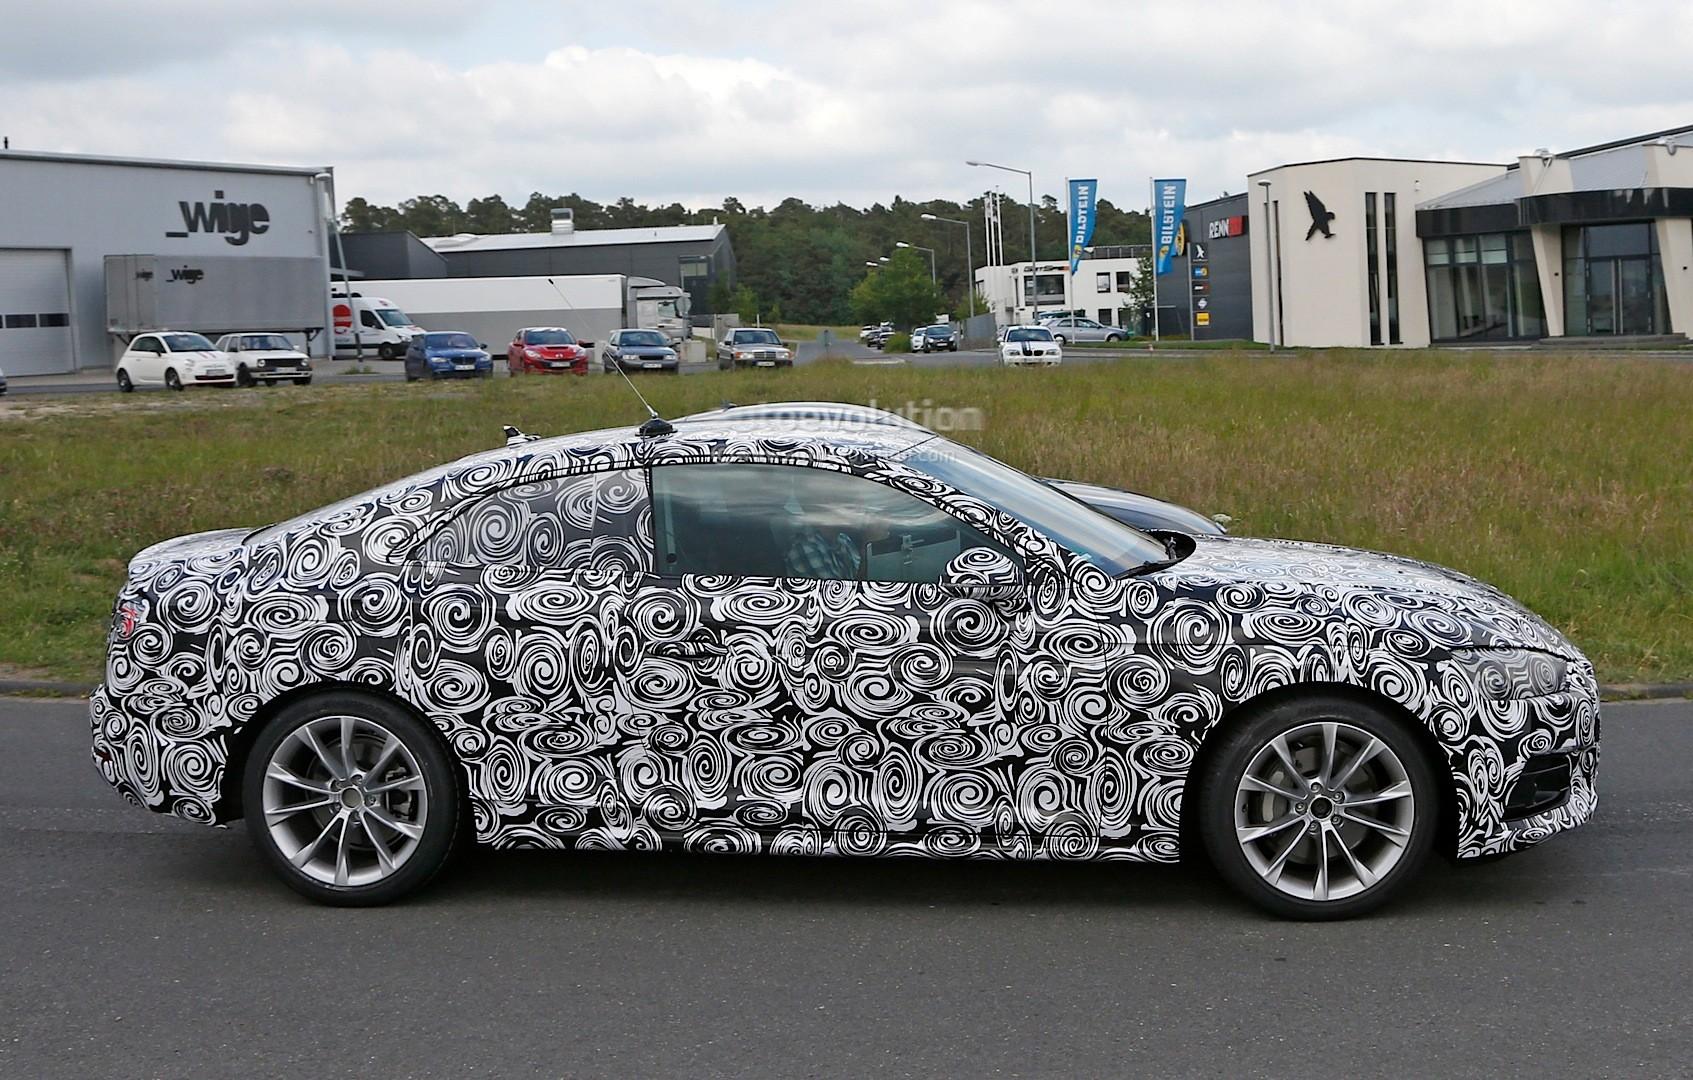 2016 - [Audi] A5 Coupé, Cabriolet et Sportback - Page 2 All-new-2017-audi-a5-coupe-first-spy-photos-show-evolutionary-design_5